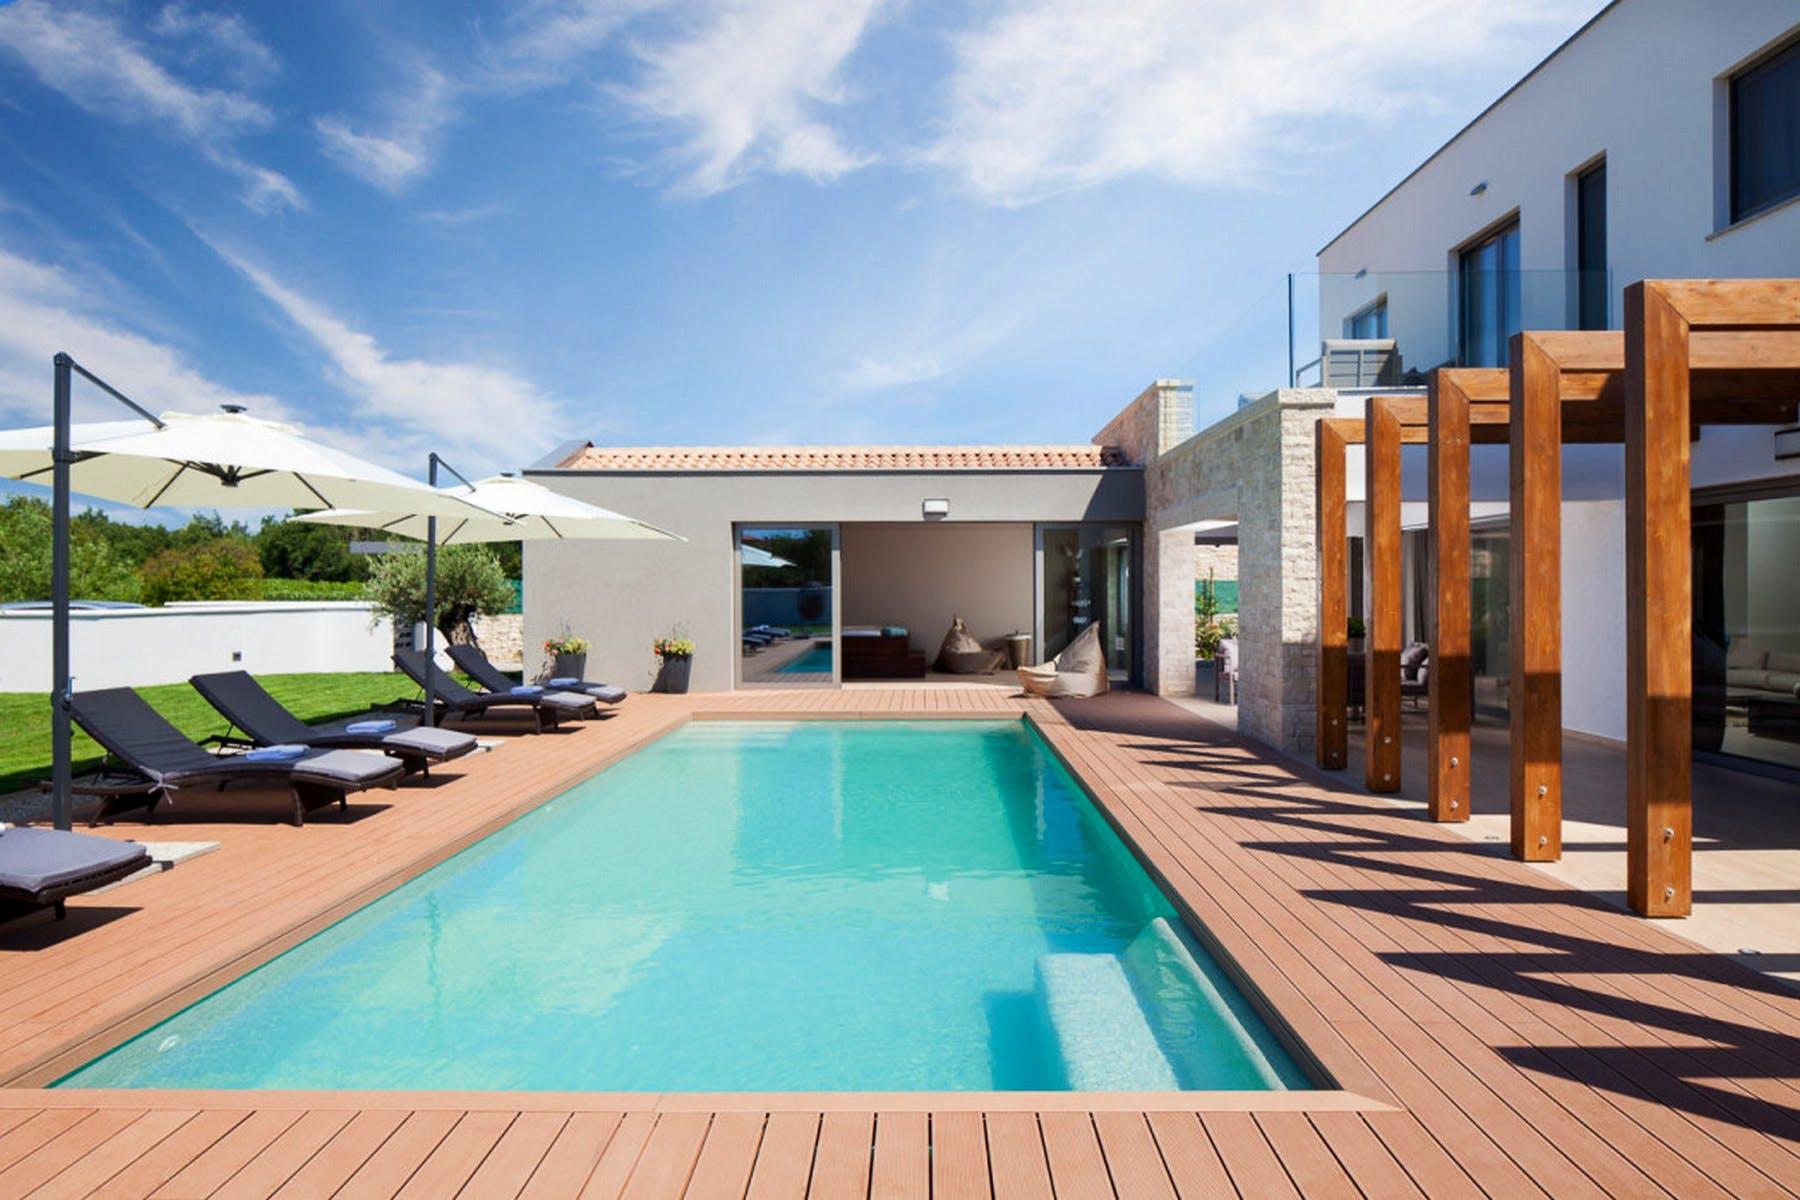 Spacious pool with sundeck